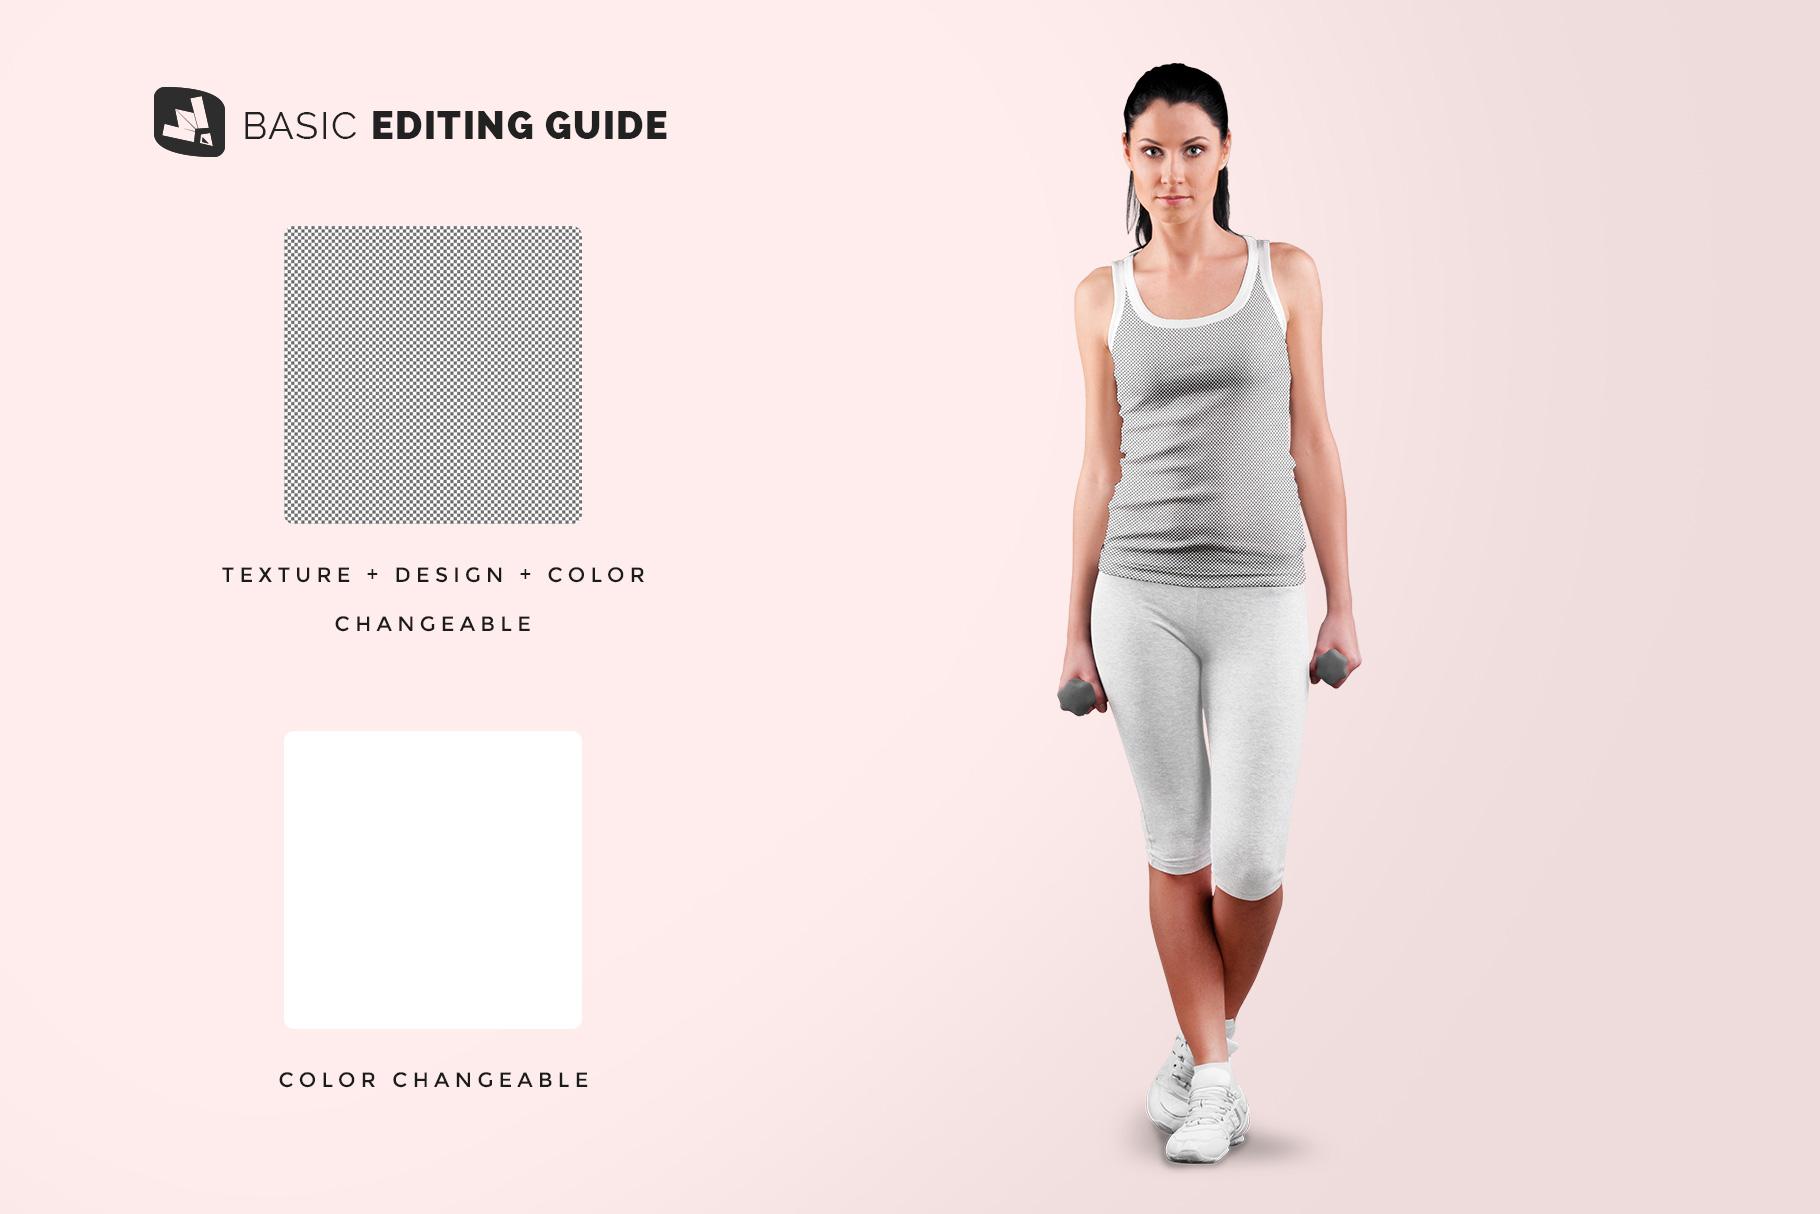 editability of the female sleeveless gym outfit mockup